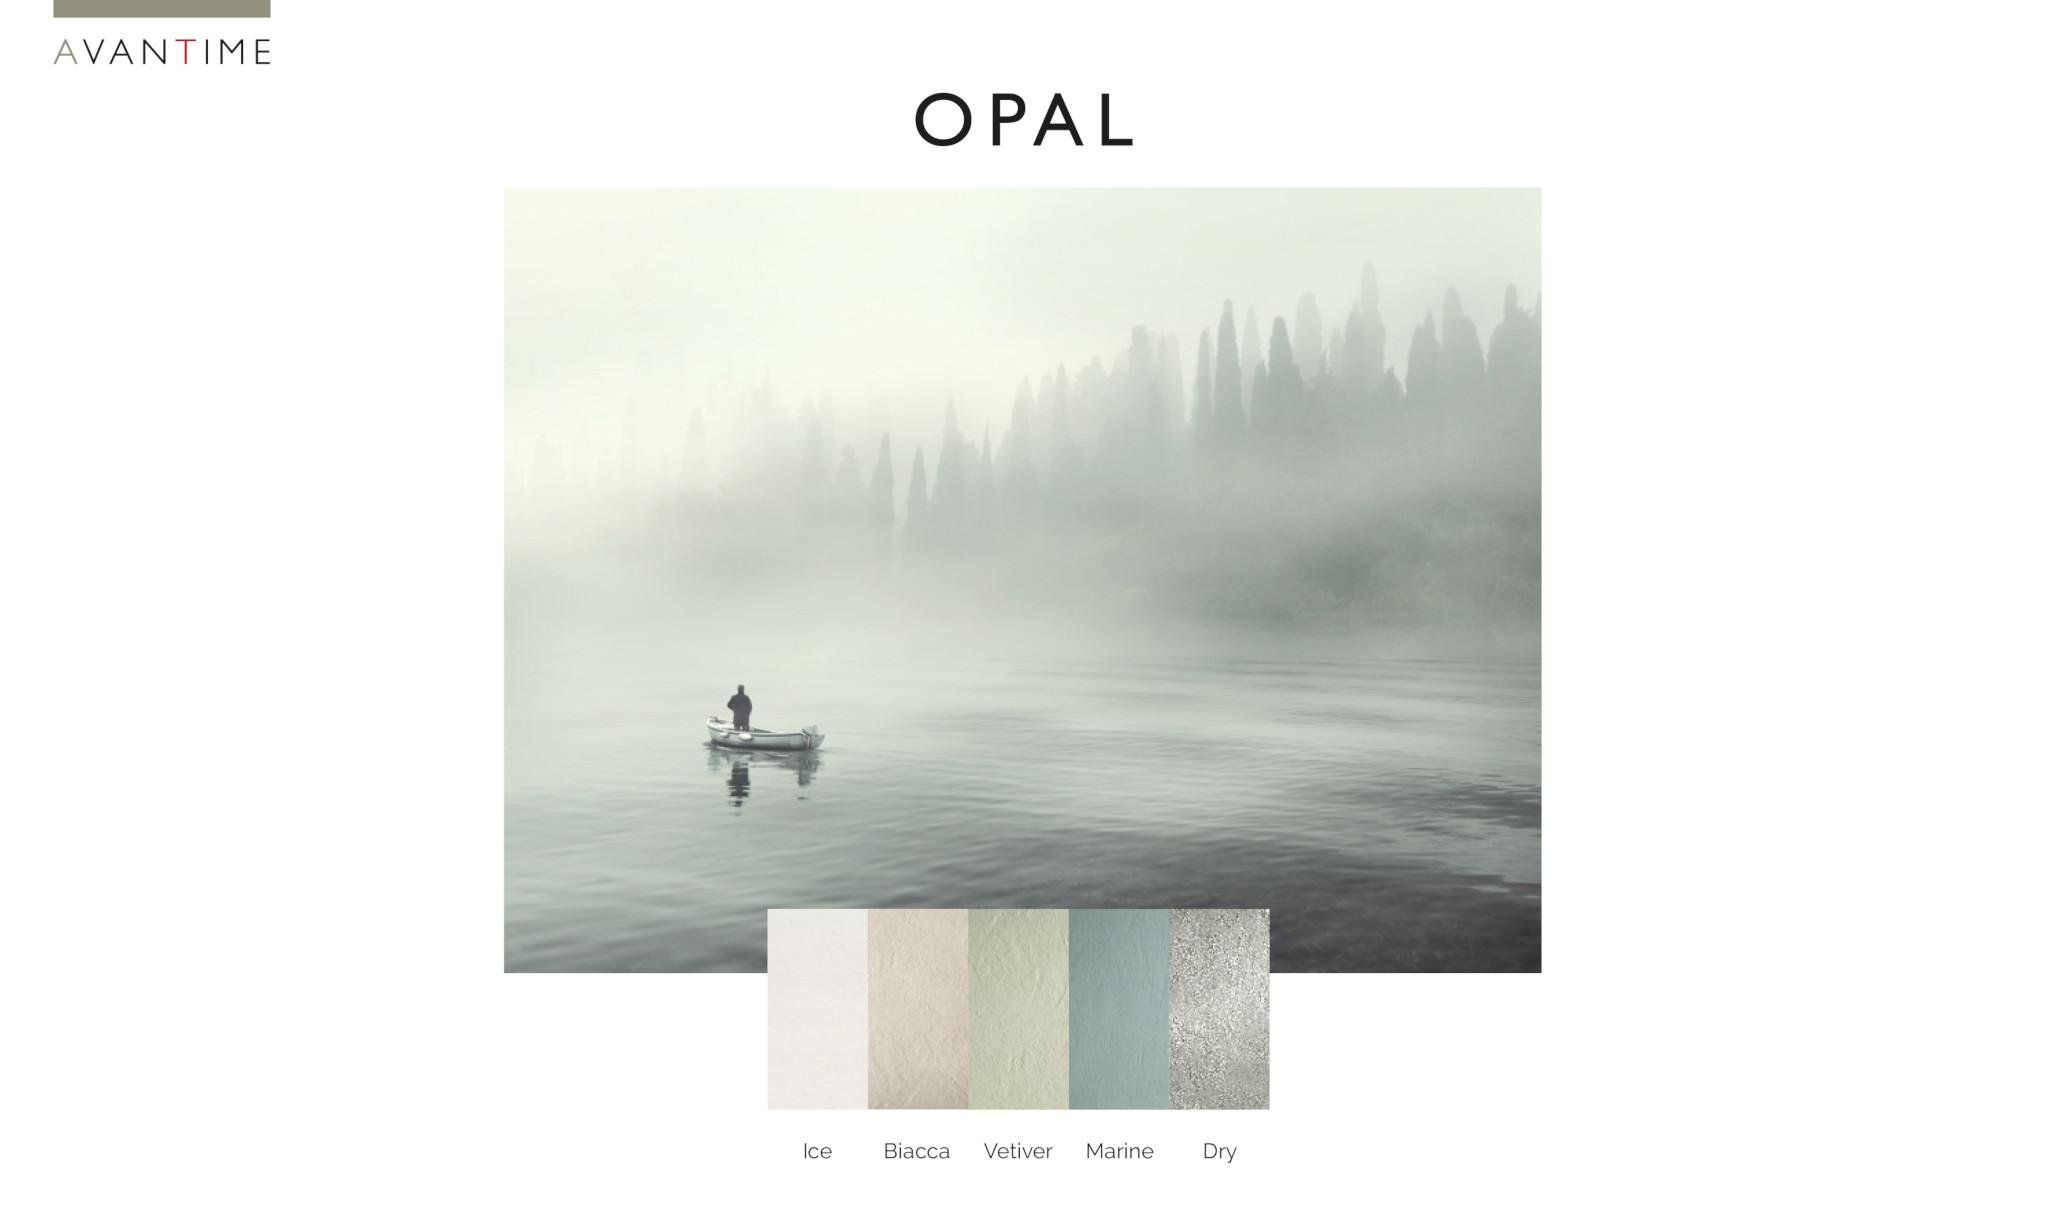 Inspiration Pallette - Opal